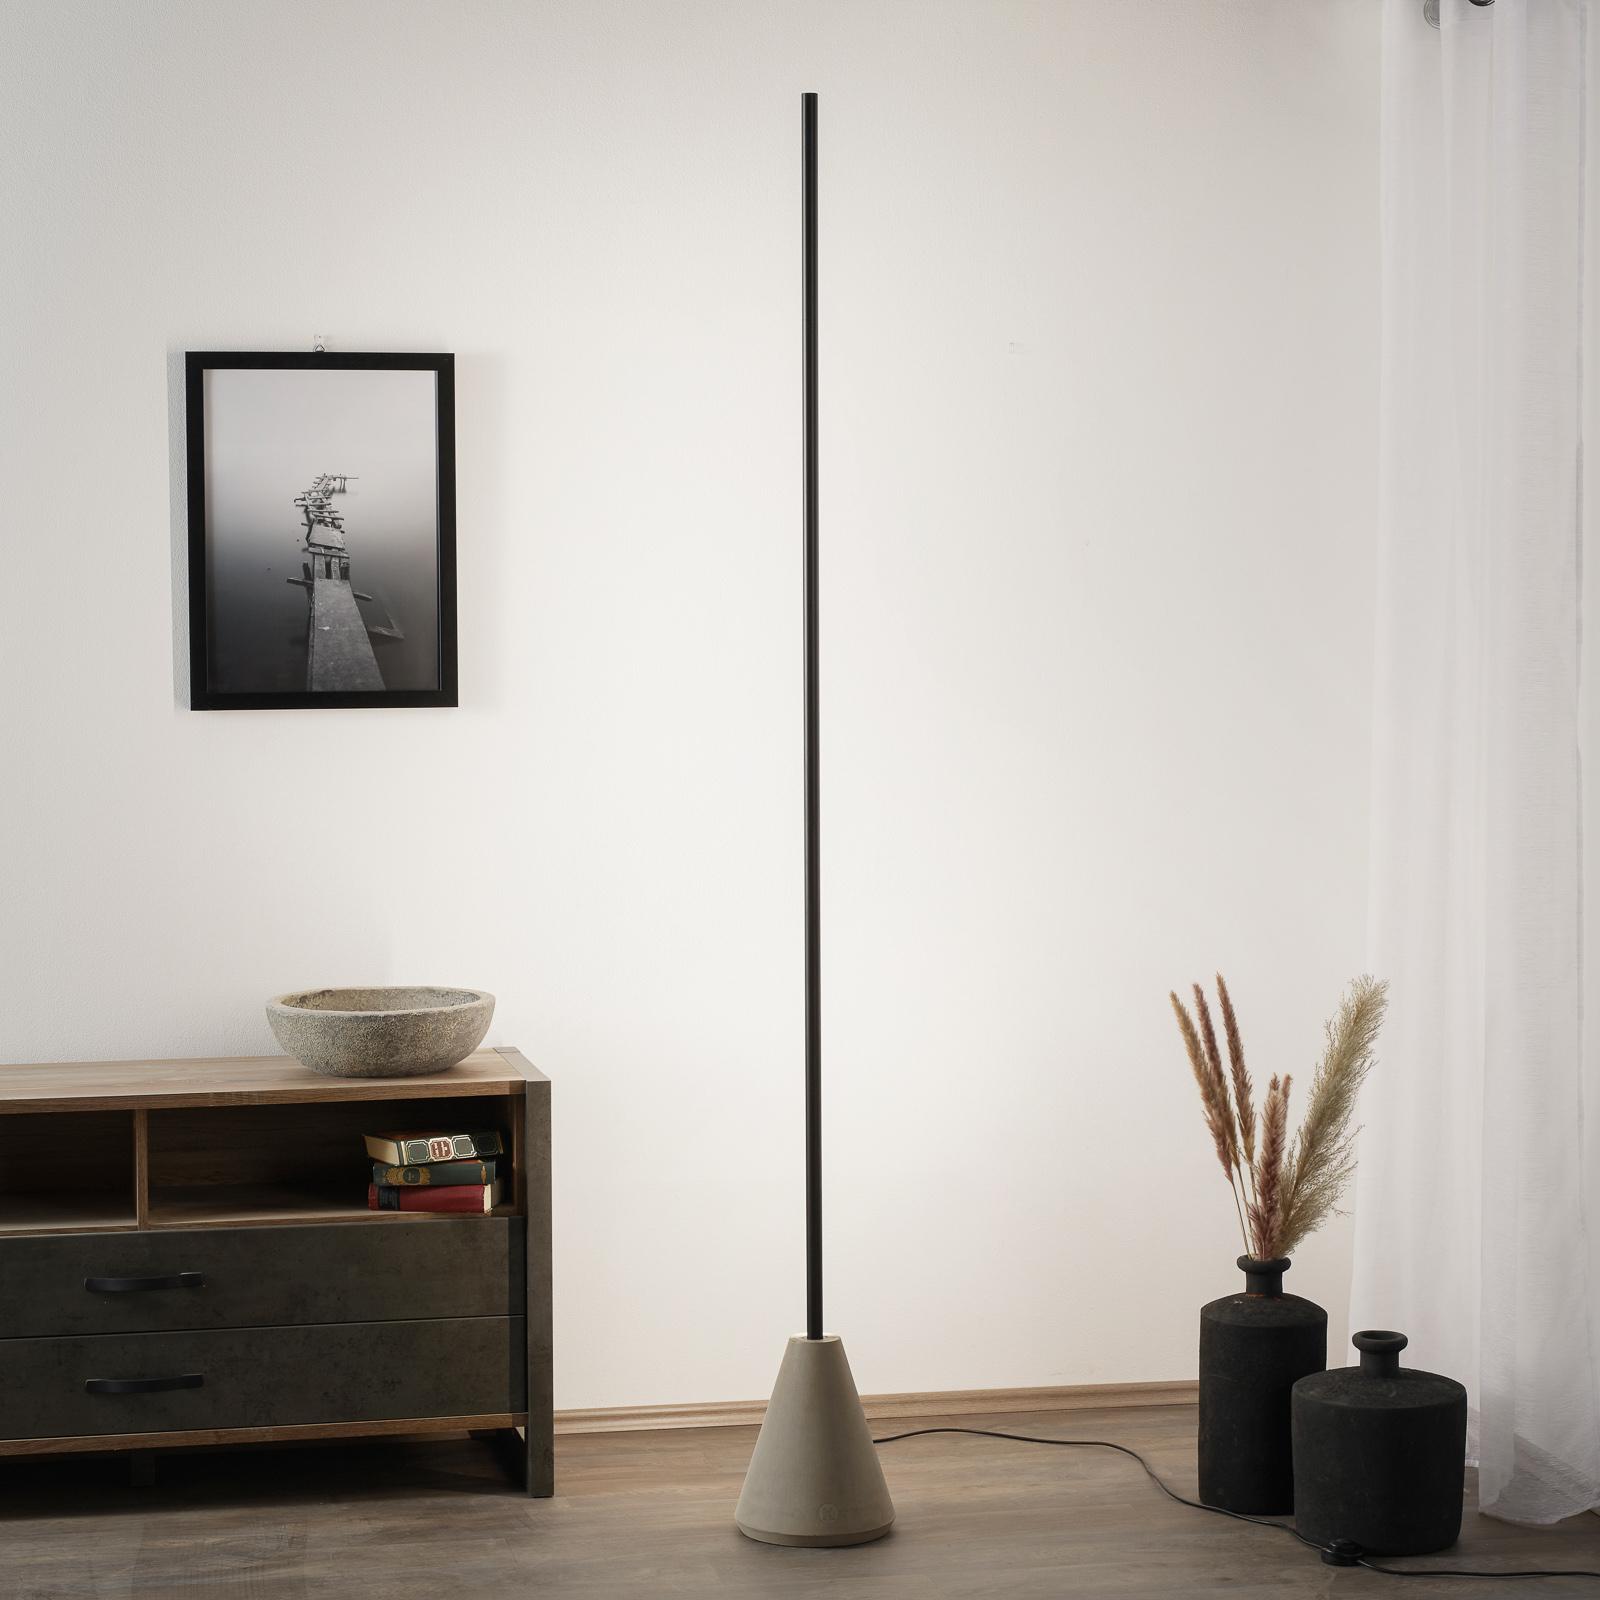 Karman Cupido LED vloerlamp, Tunable White via app